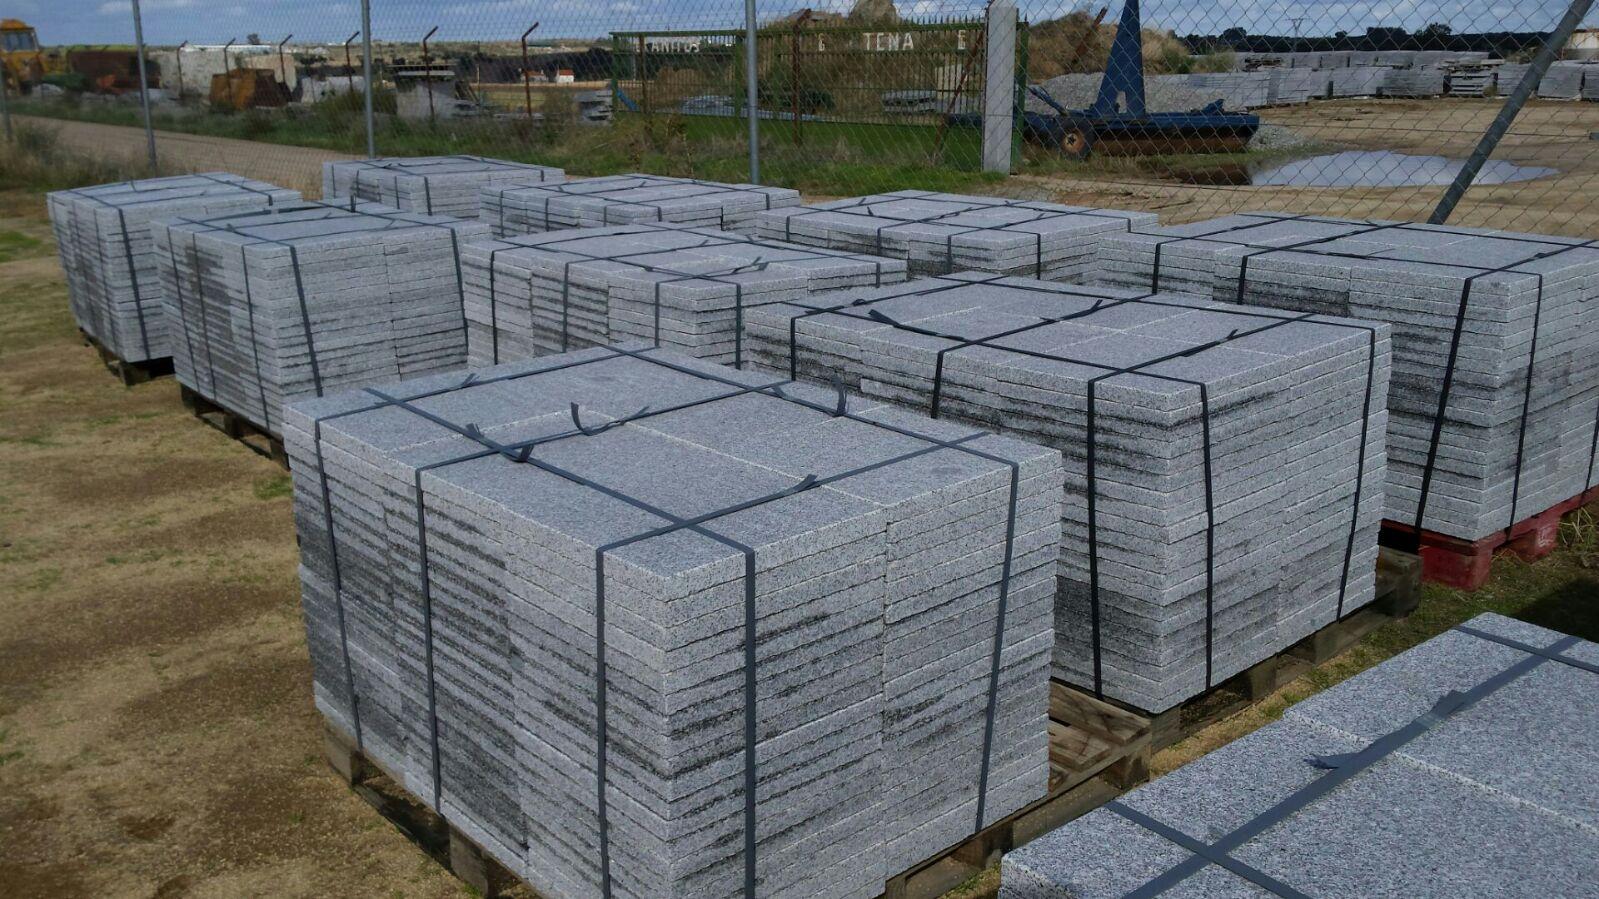 Losas o baldosas granito gris quintana para pavimentos for Granito para suelos precio